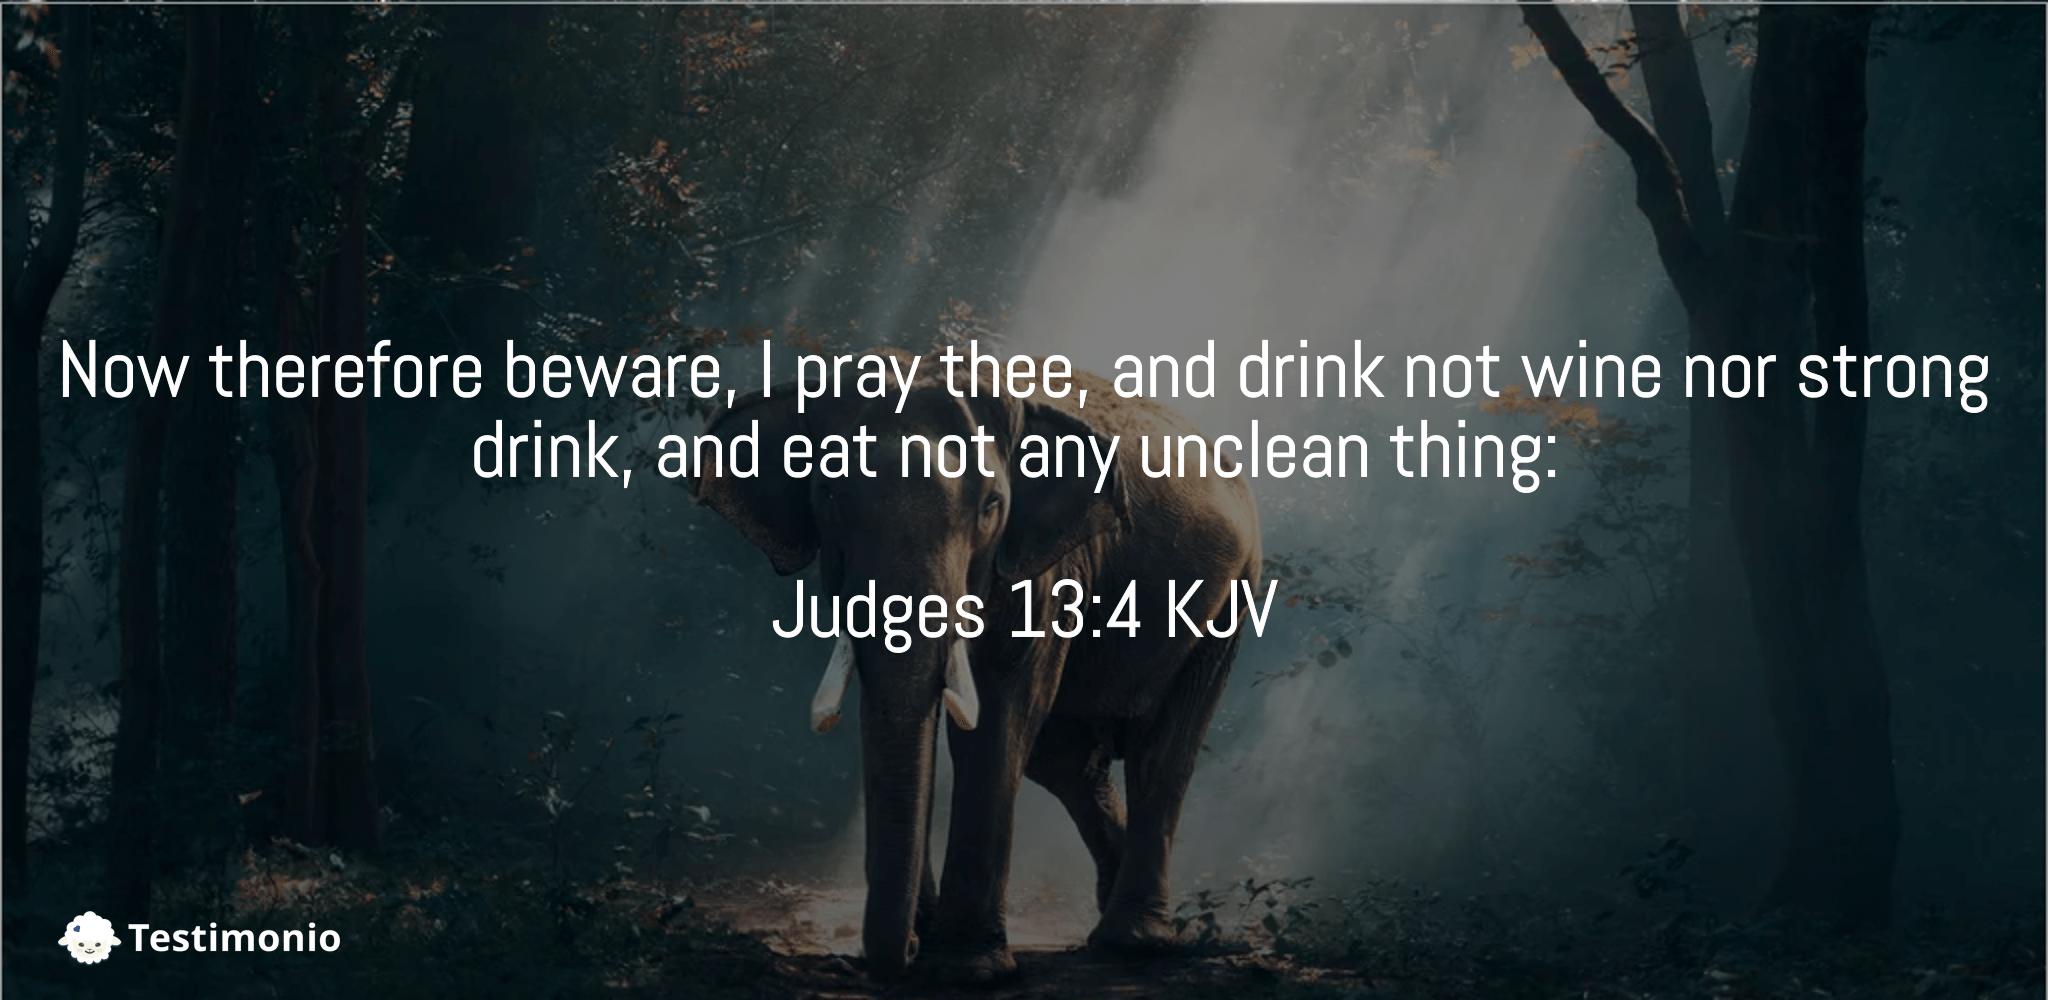 Judges 13:4